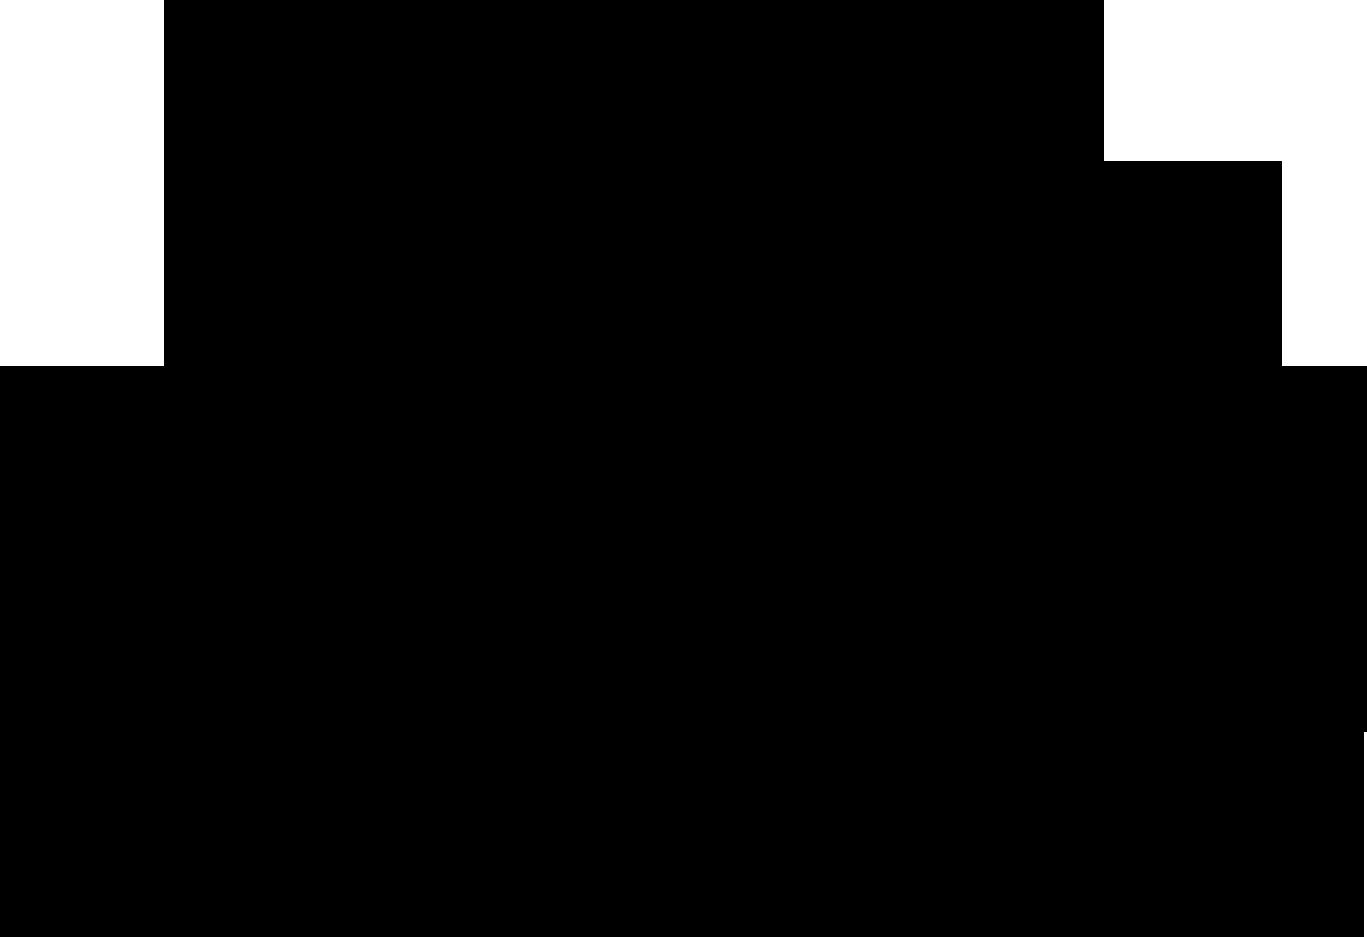 Gogeta Super Saiyajin 3 lineart by Arrancarippo on DeviantArt